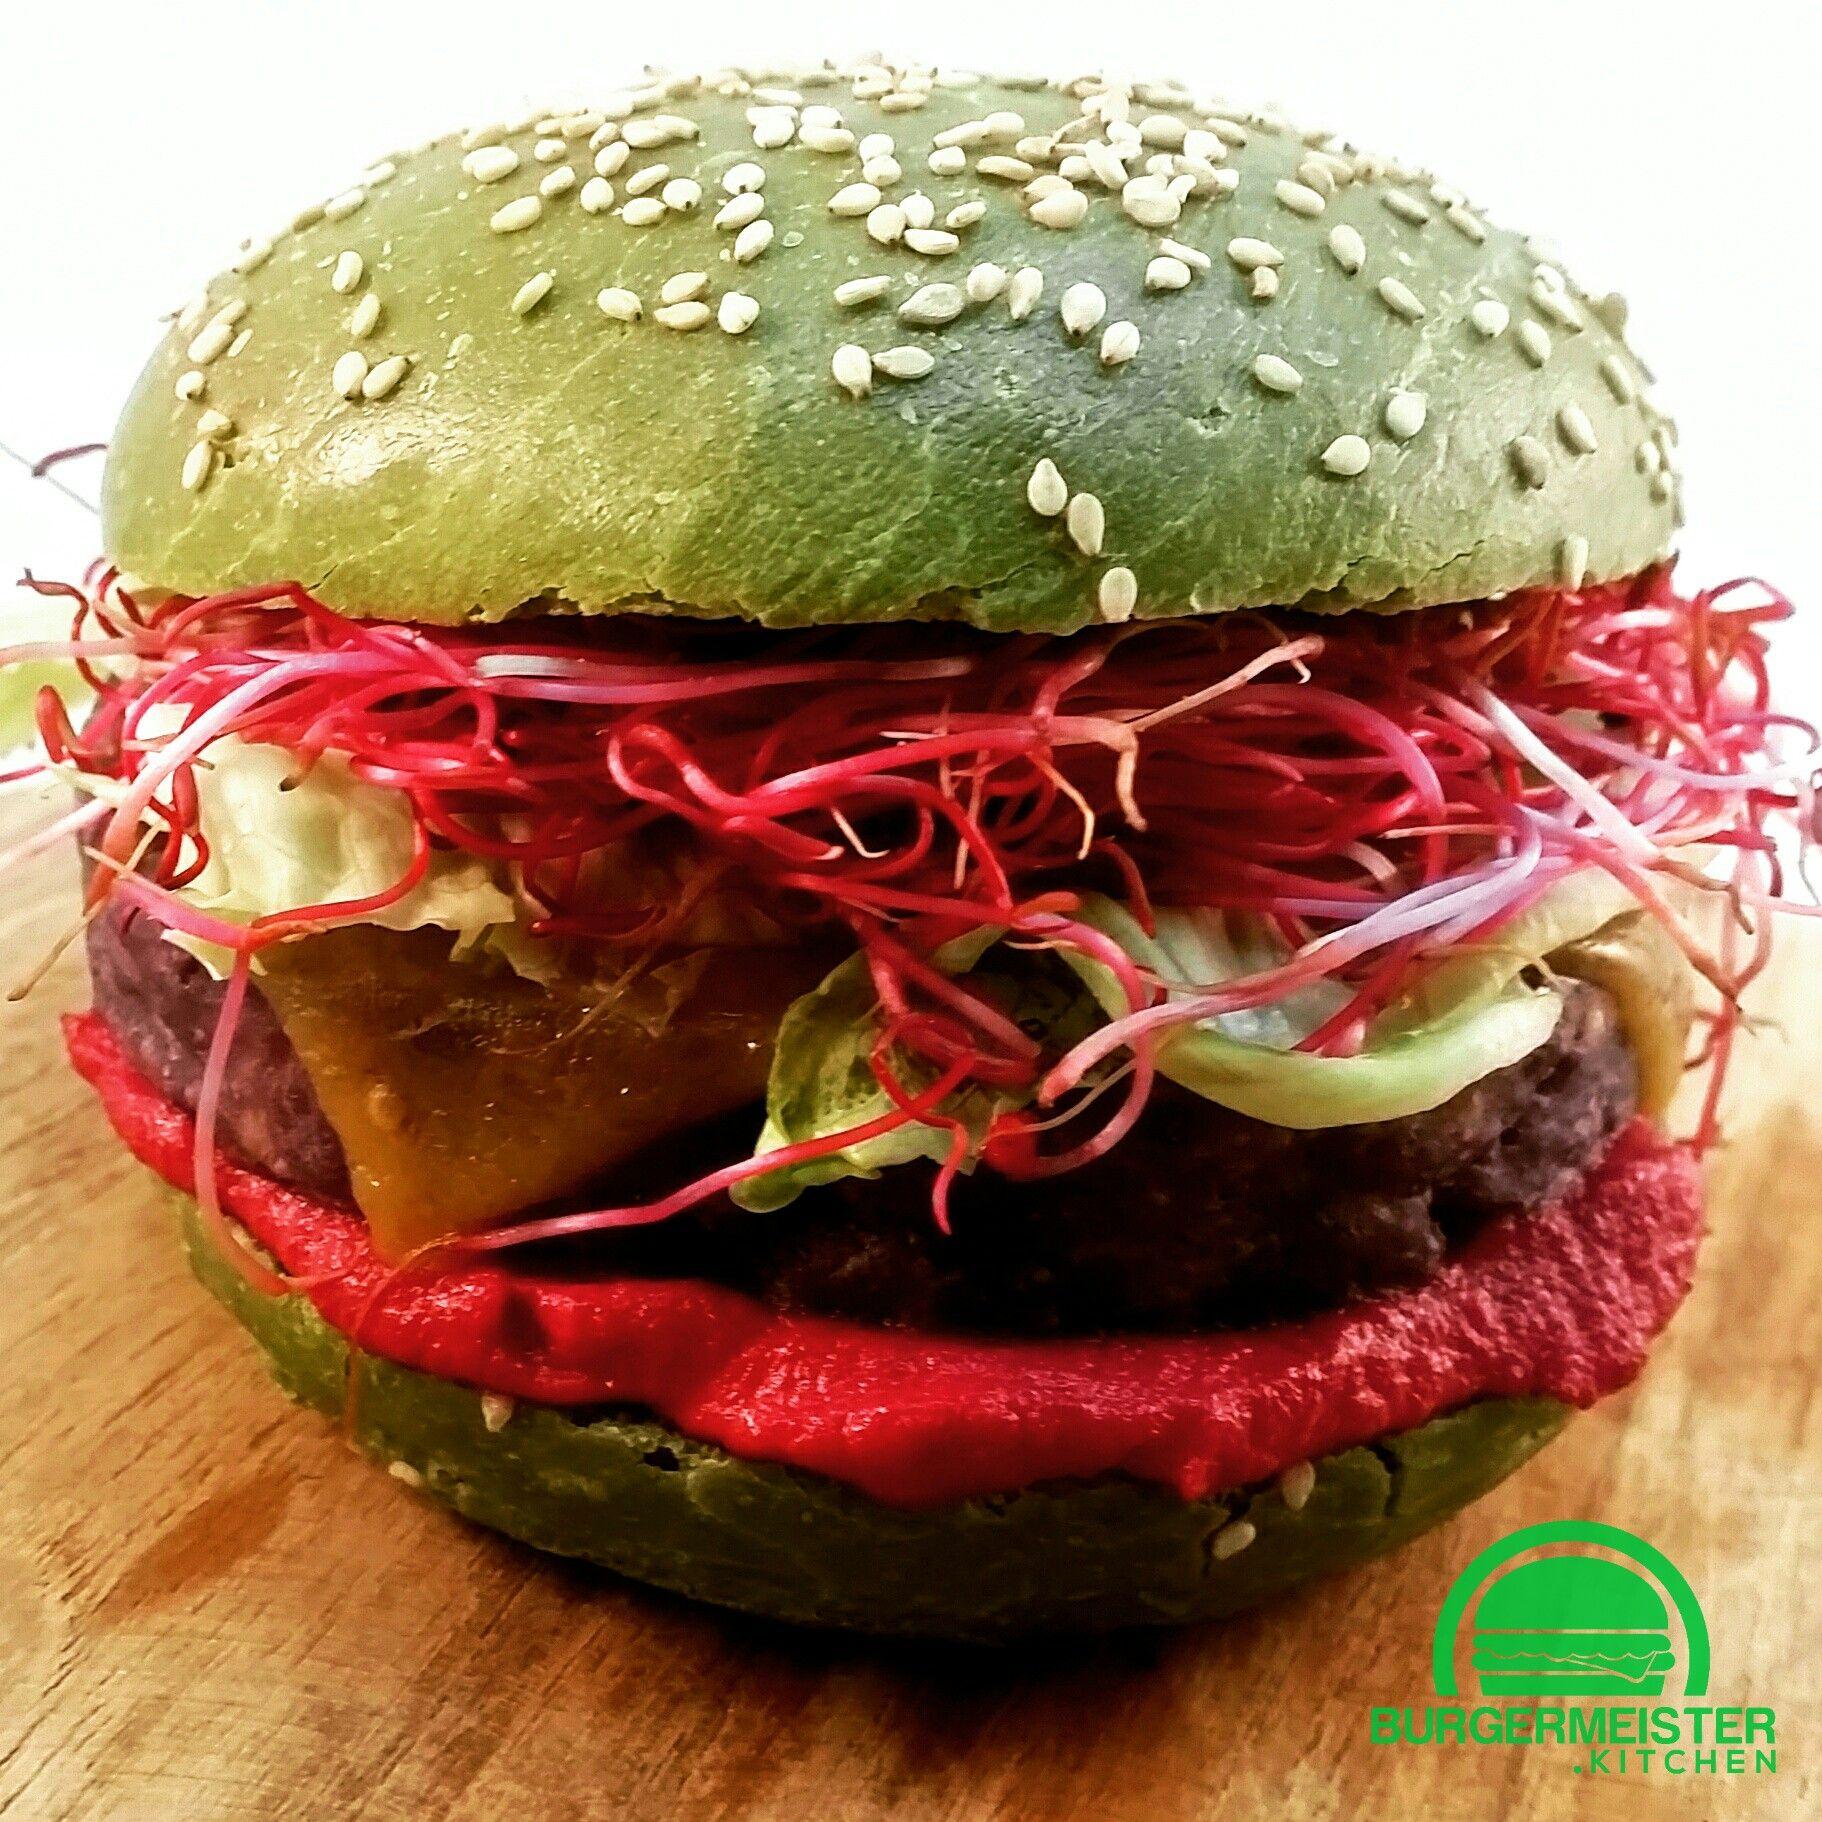 The Monster Green Burger Bun Colored With Spinach Veggie Blue Potato Pattie Hummus Full Recipe At Http Burgermei Burger Buns Burger Spinach Burgers